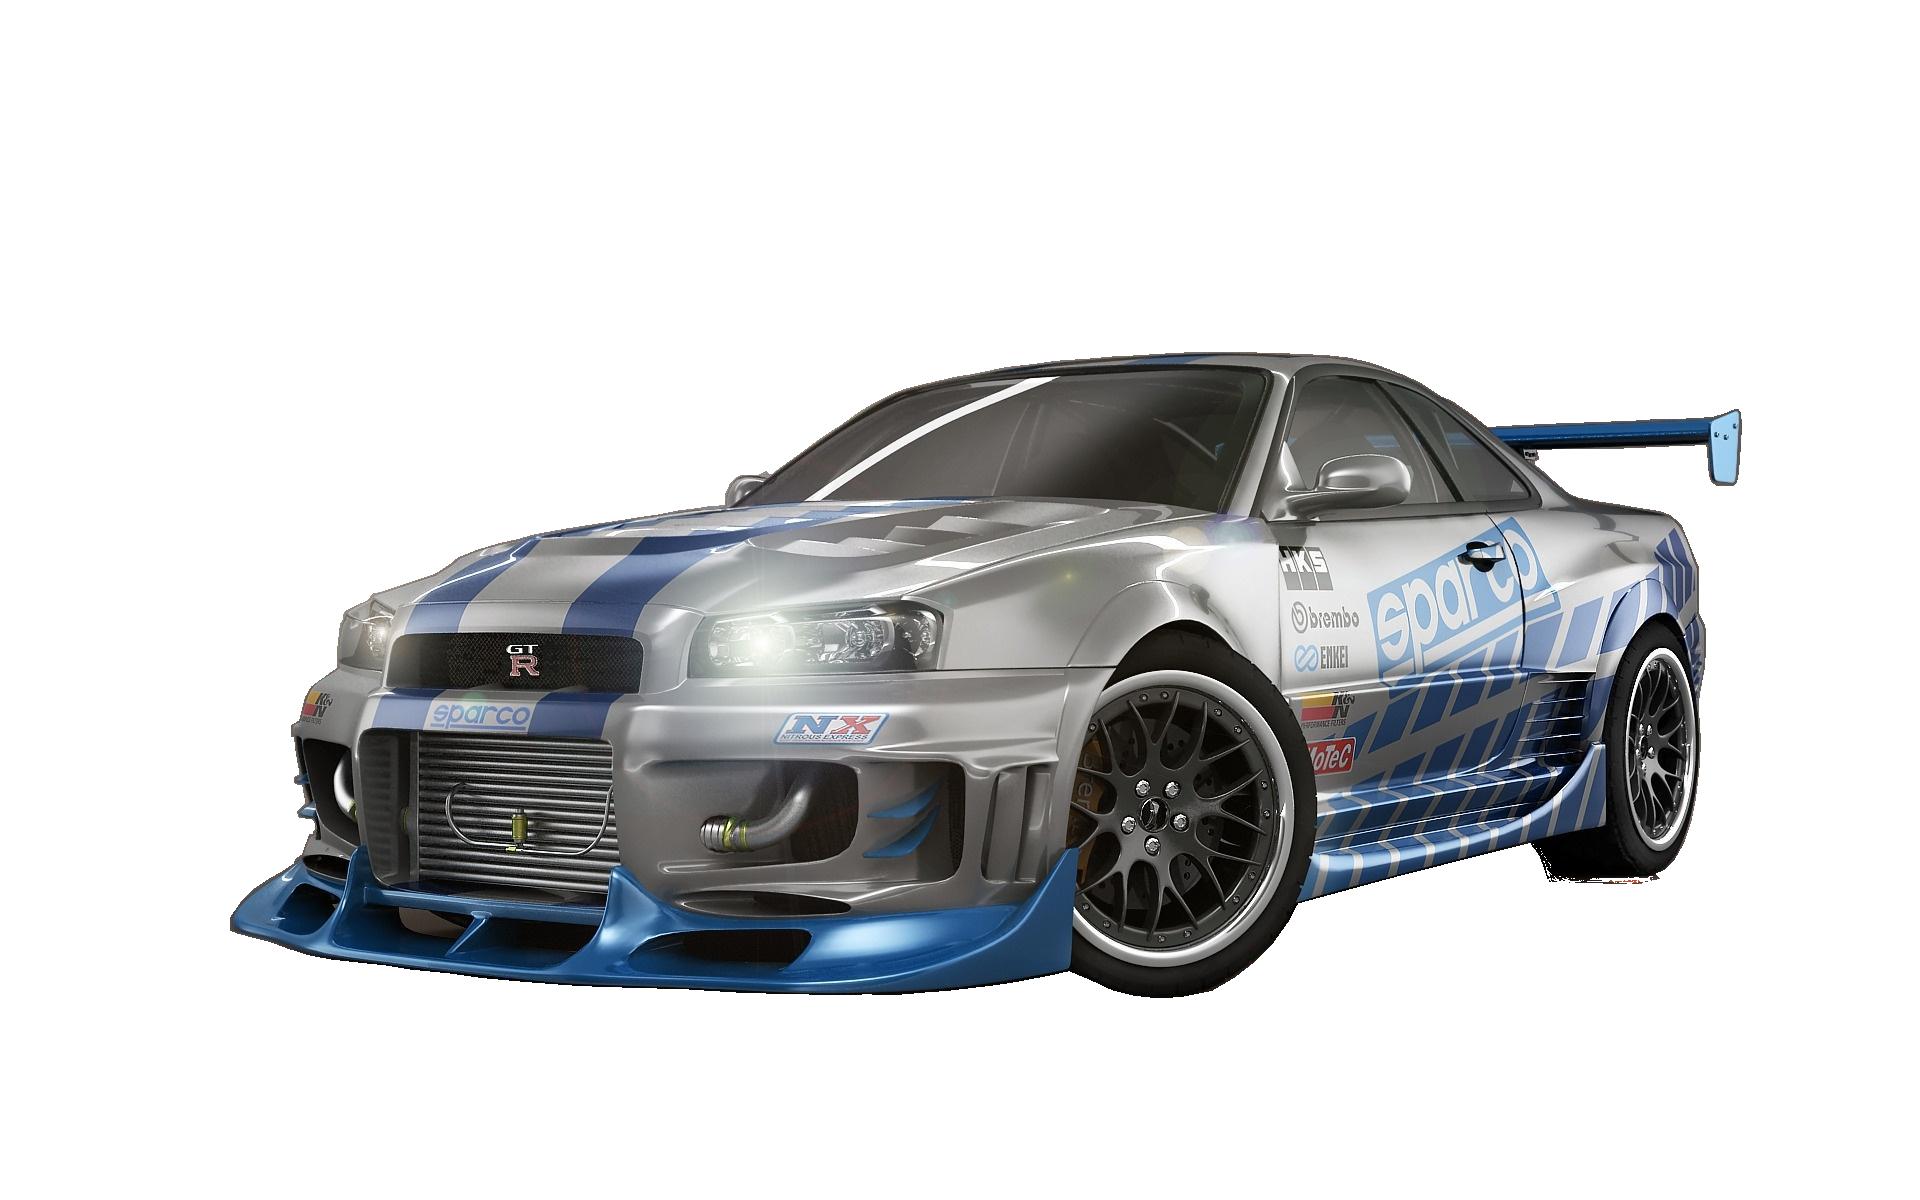 Pubg Png Background Hd Download: Наклейка Nissan Skyline Брайана О'Коннора PNG